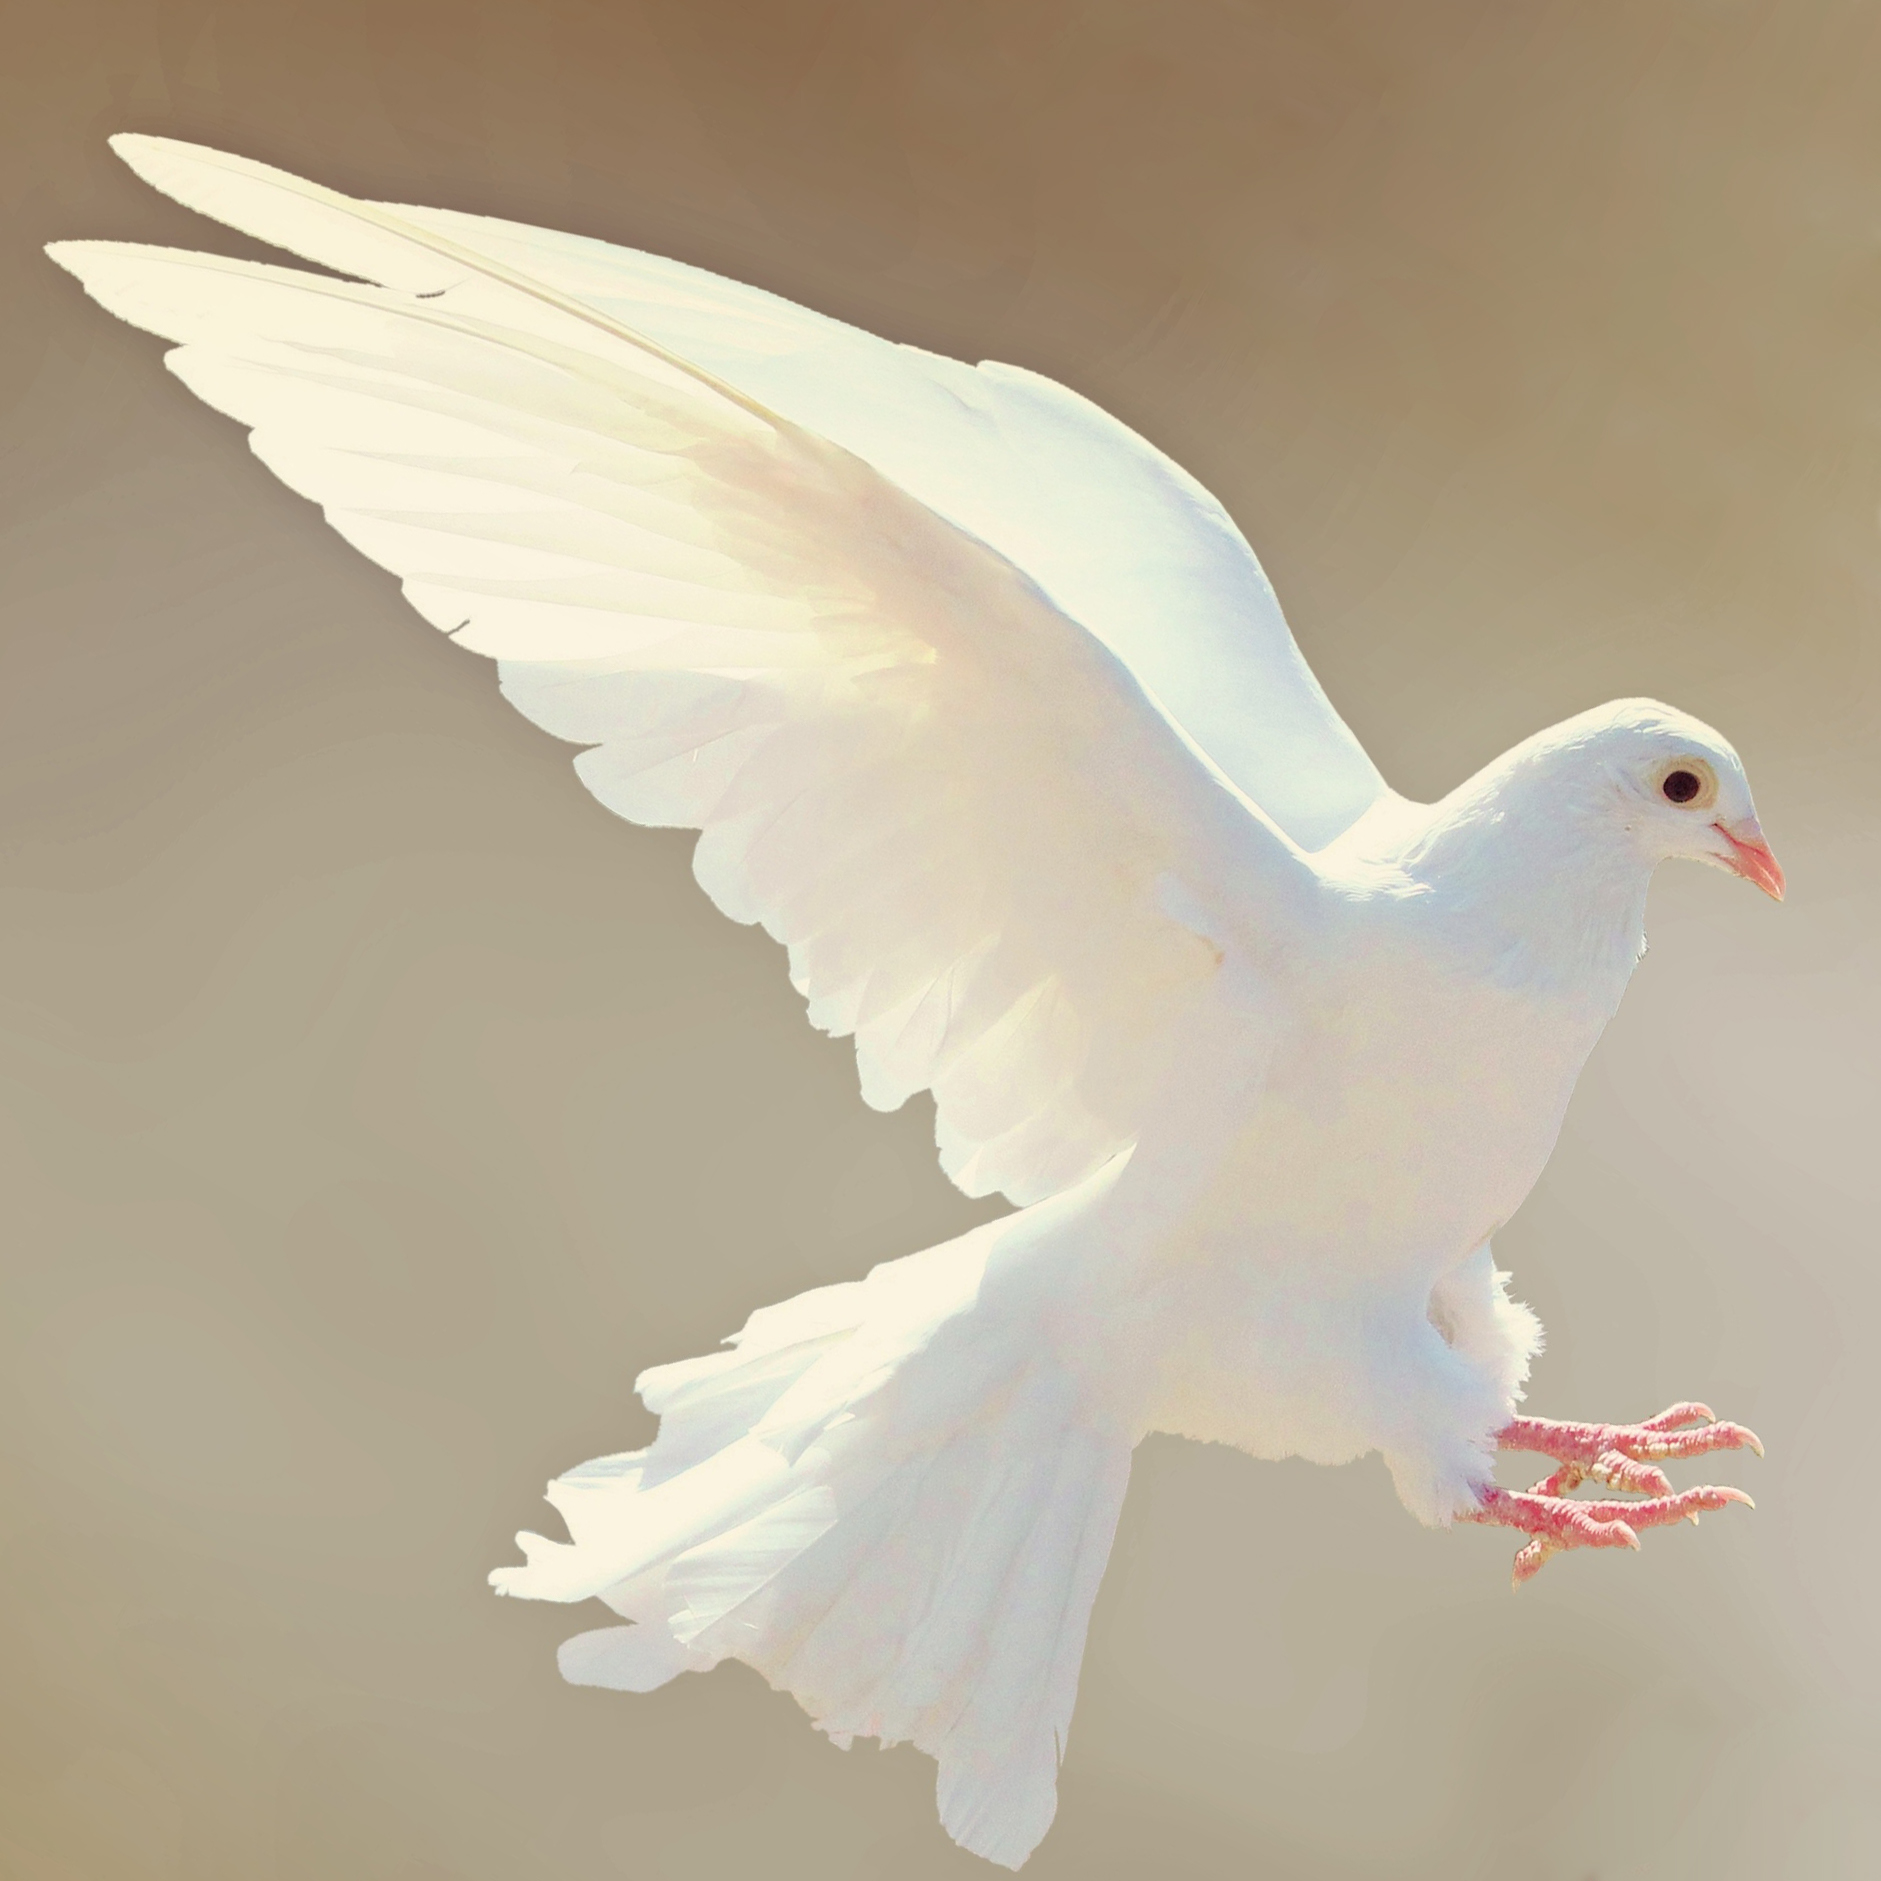 dove-2516641.jpg